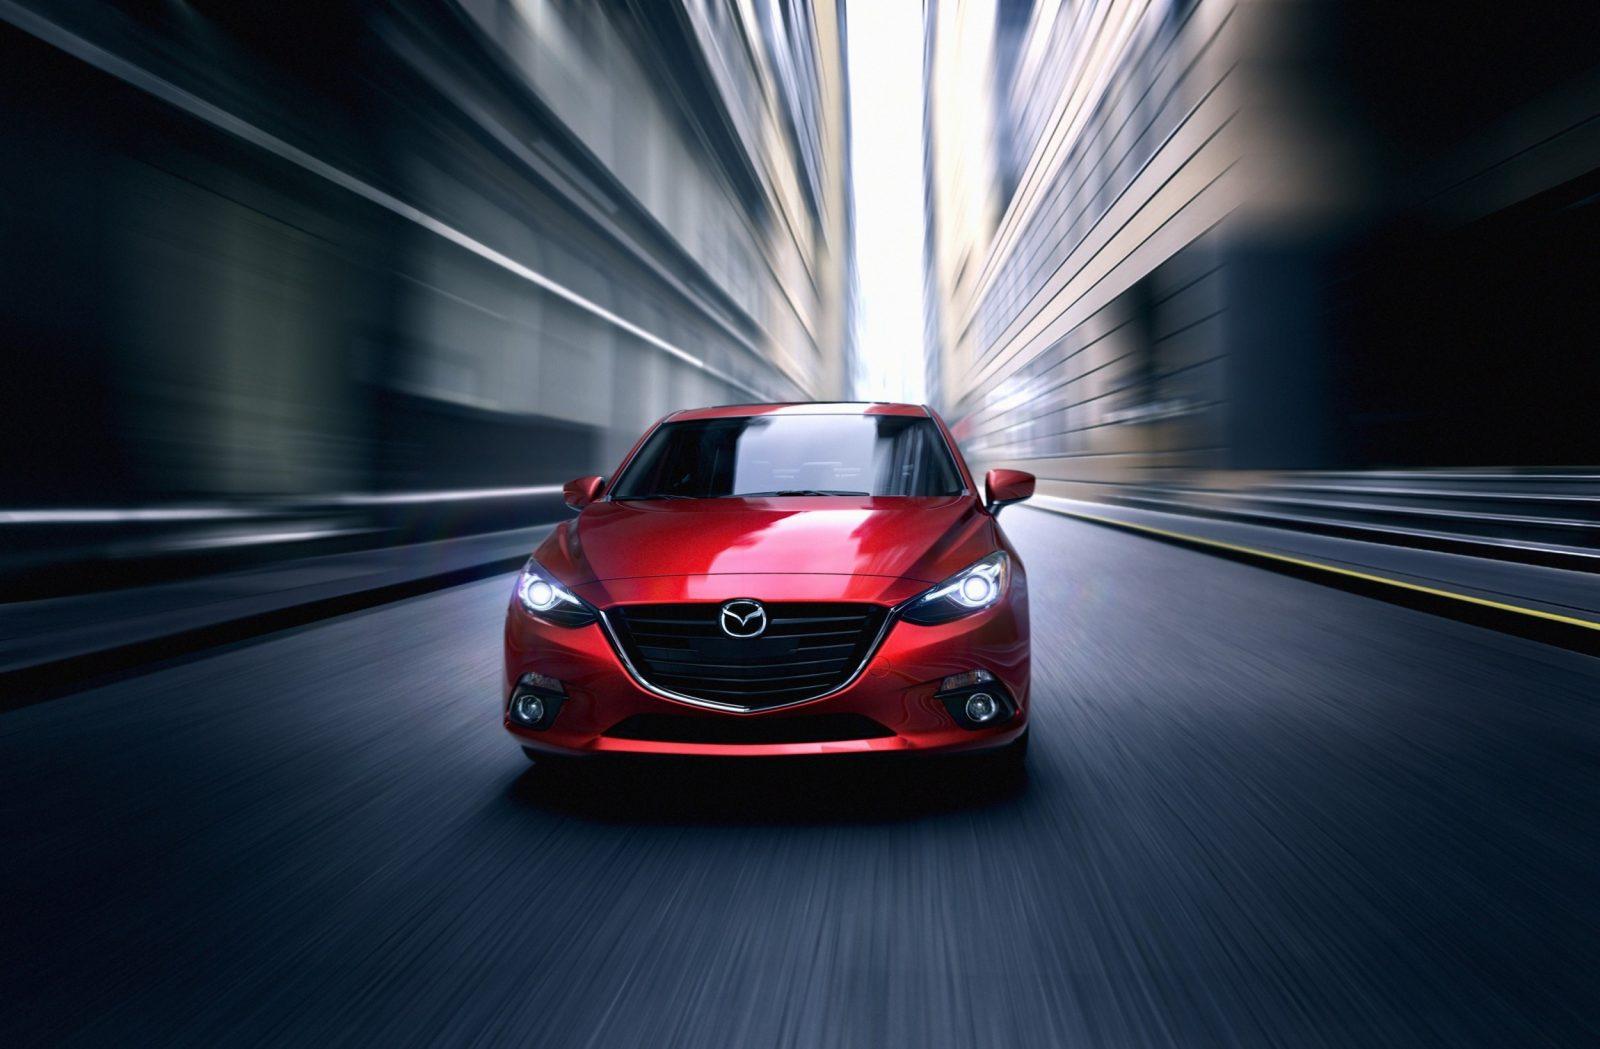 2014 Mazda3 4D CGI (04)